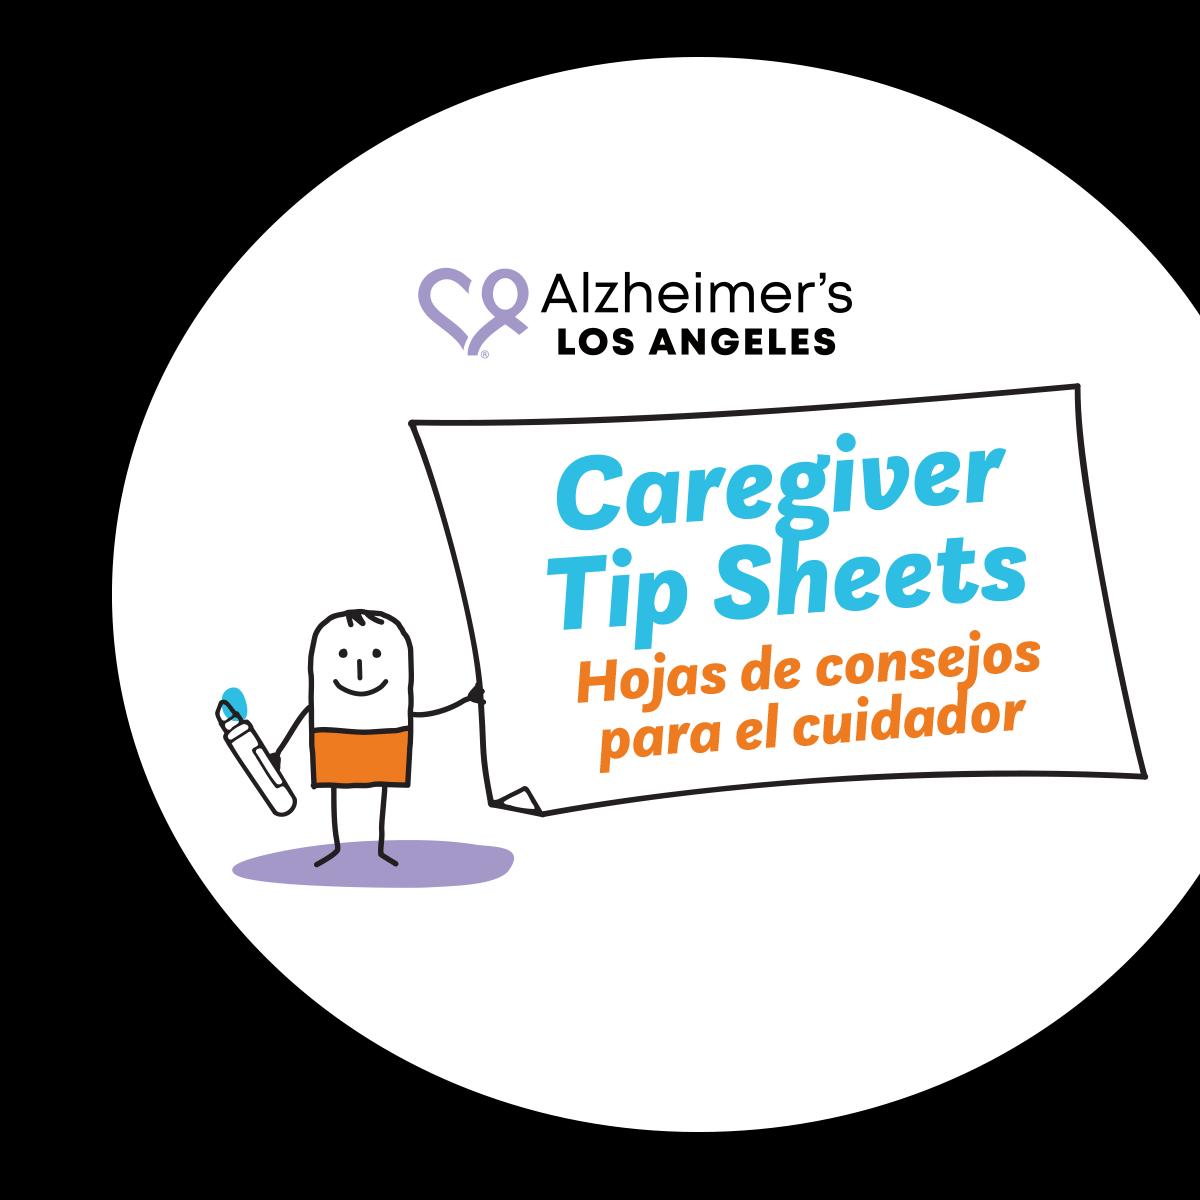 Caregiver Tip Sheets cover